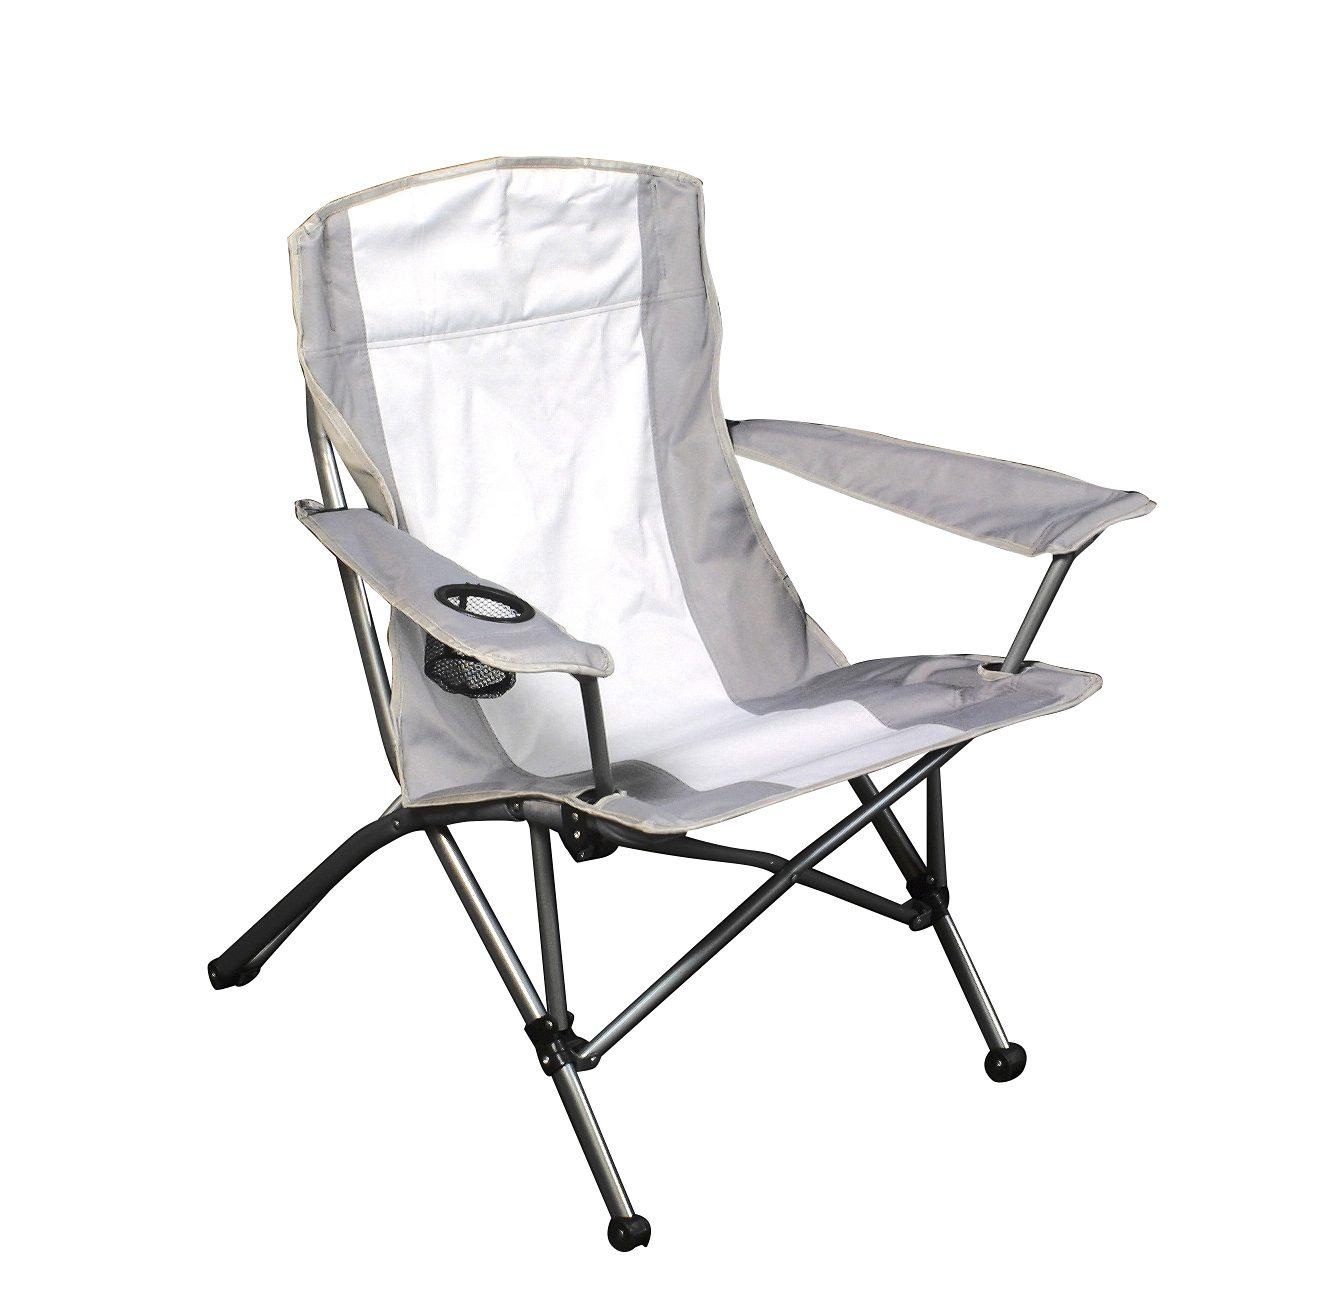 Relags Camping-Stuhl »Travelchair Lodge ST silber/grau«